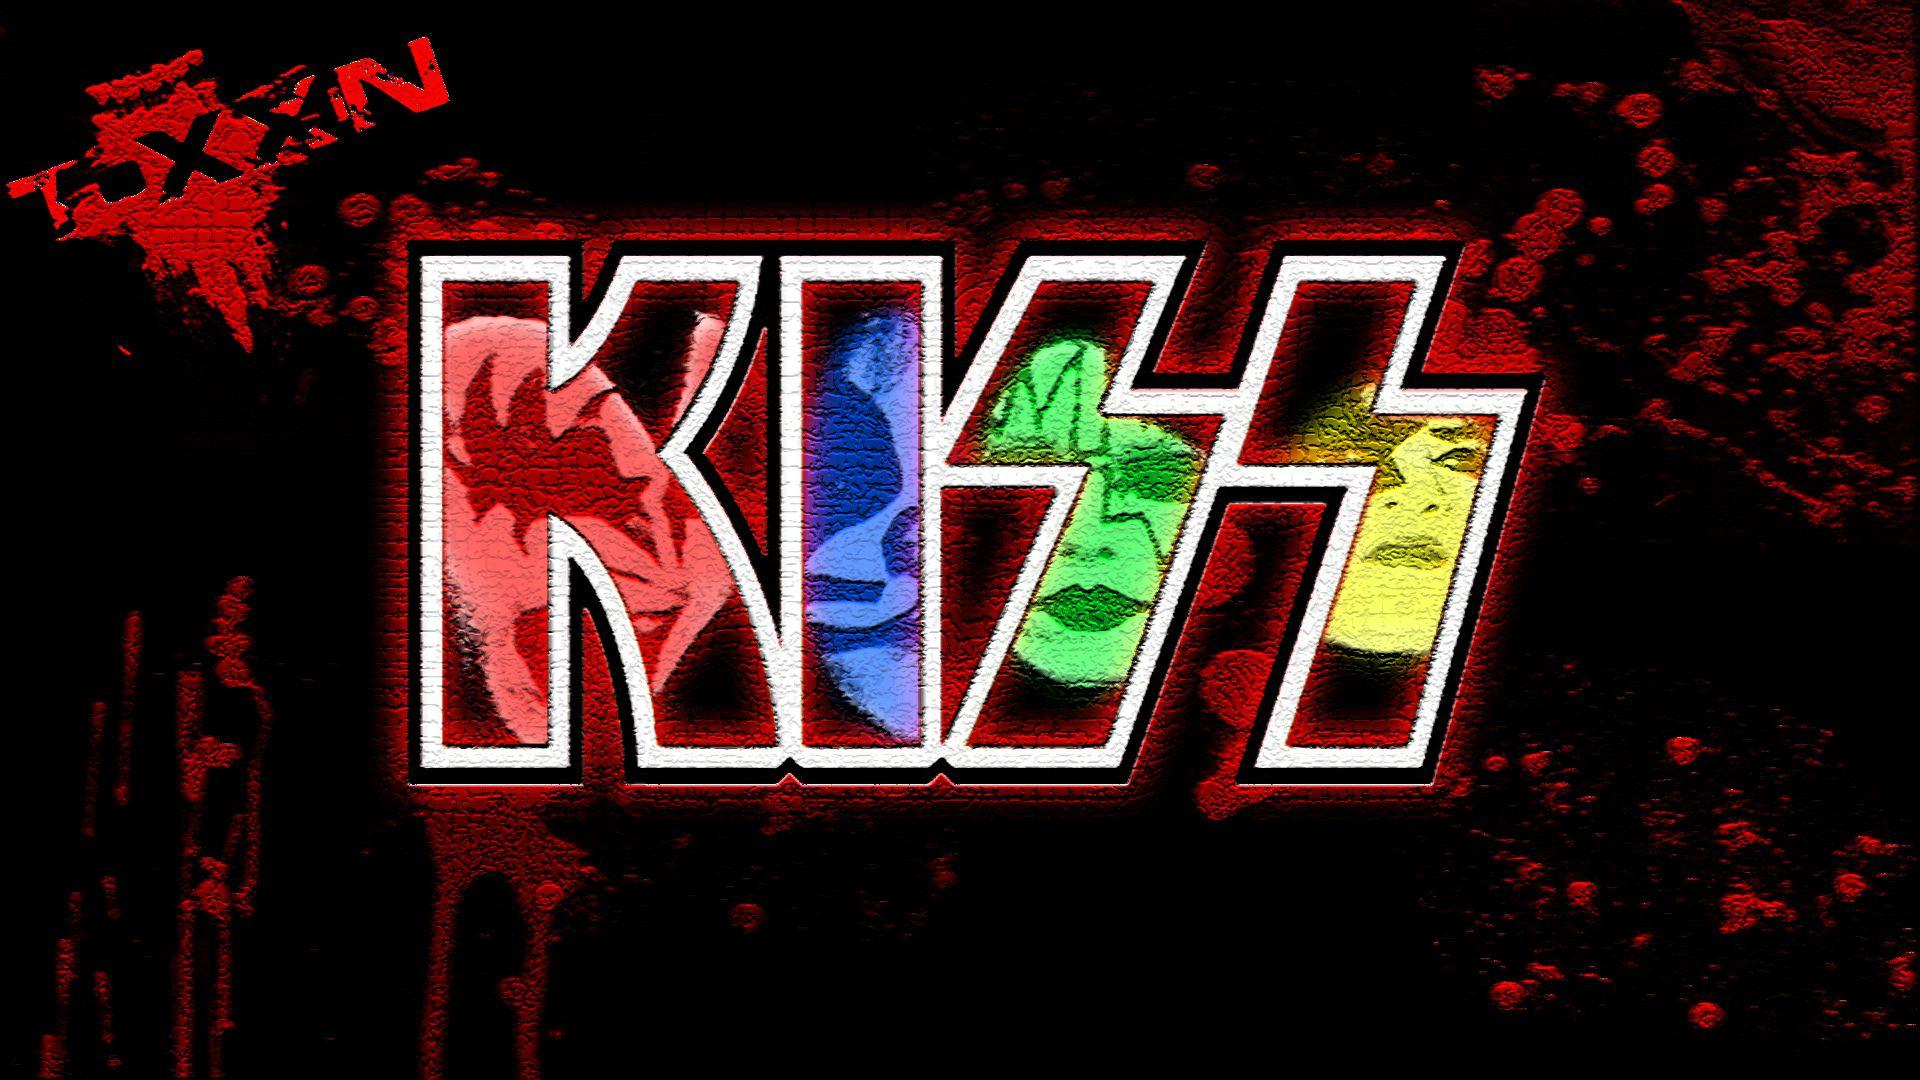 KISS Wallpaper Http://freewallpaperspot.com/wallpapers